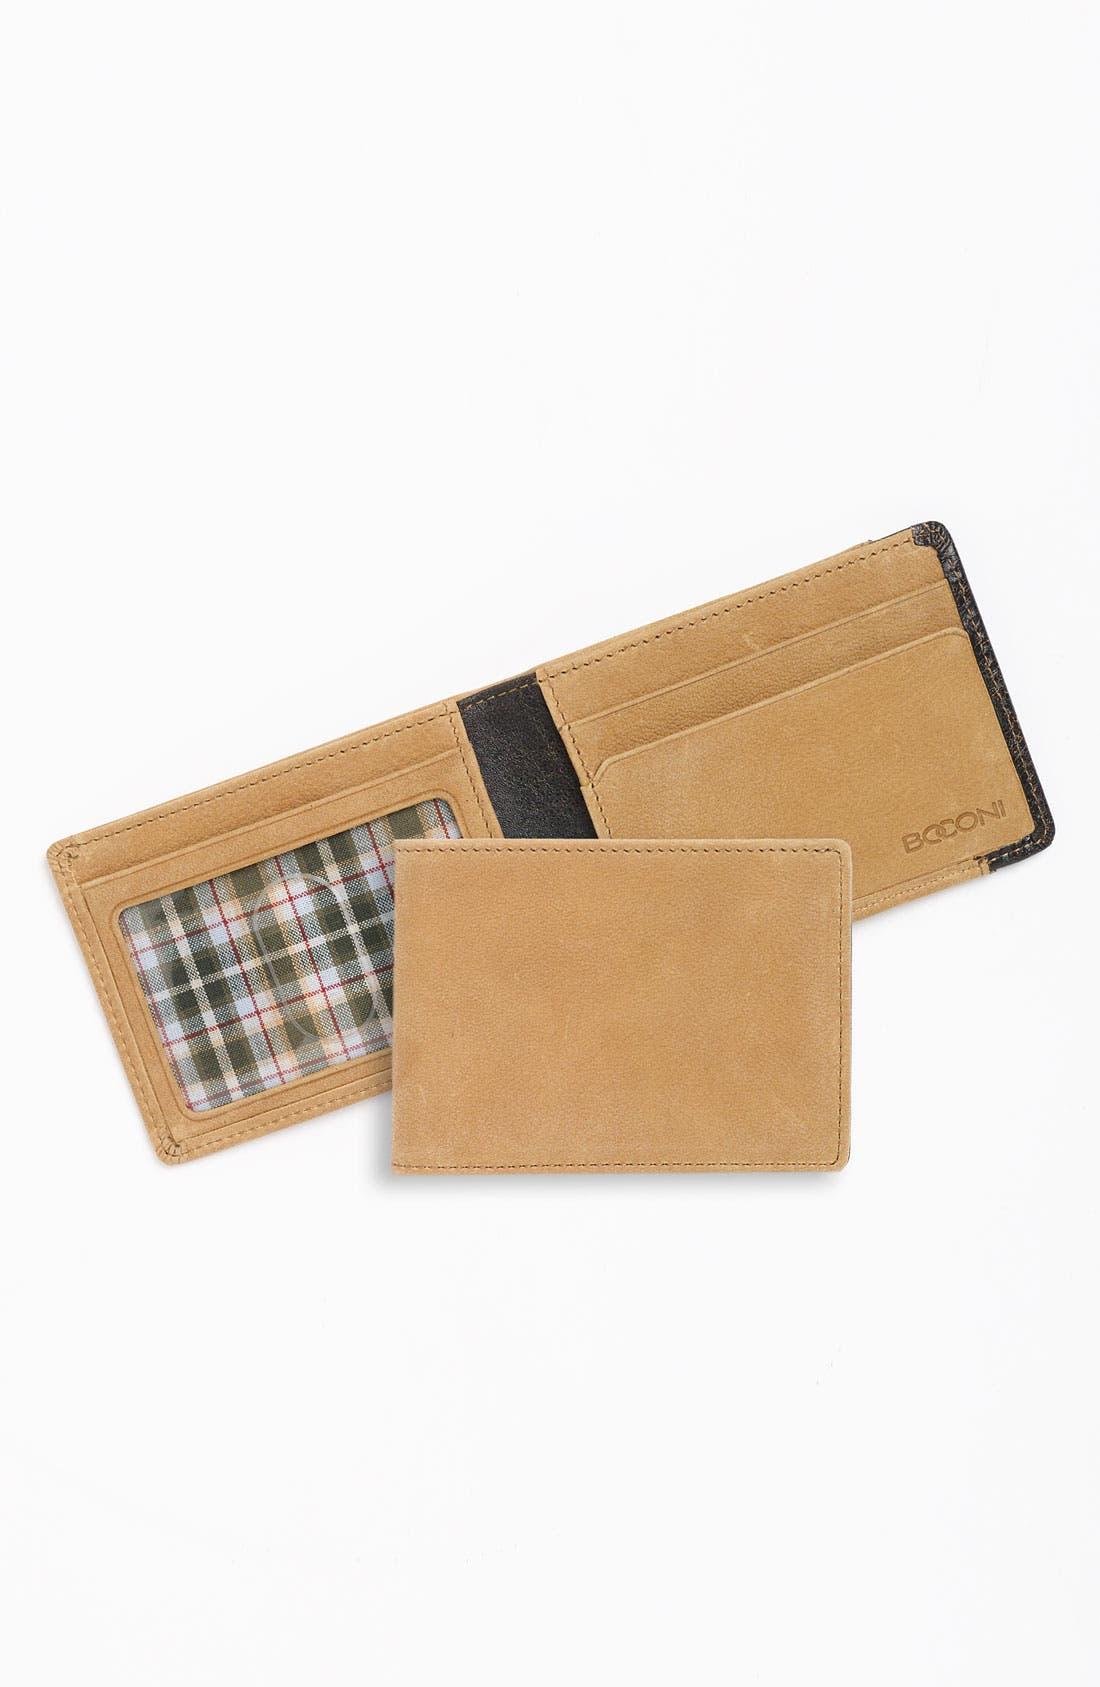 Alternate Image 1 Selected - Boconi 'Leon - Slimster' Leather Wallet